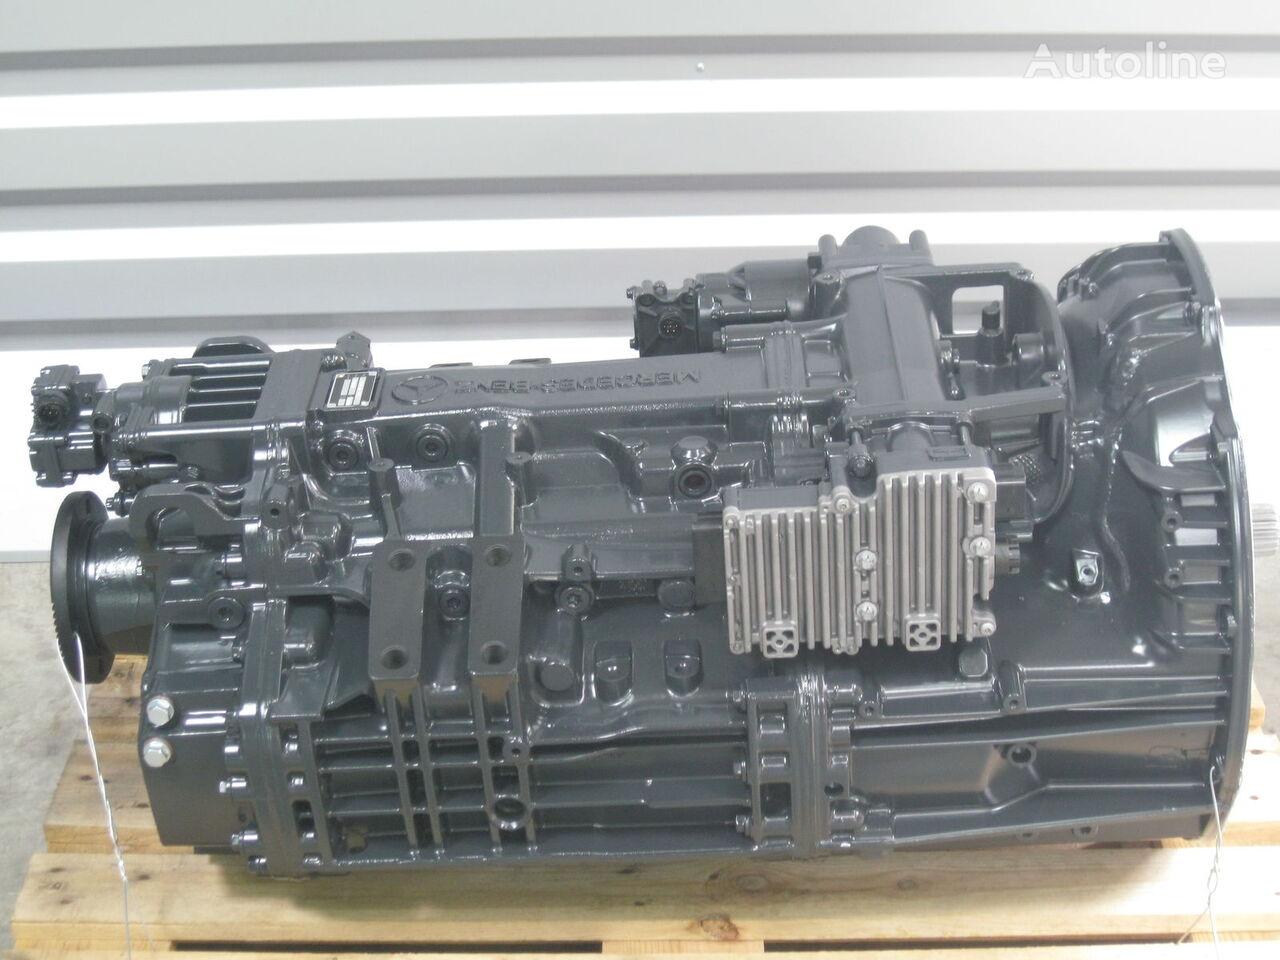 BOITE DE VITESSES Getriebe für MERCEDES-BENZ AXOR - ACTROS Sattelzugmaschine